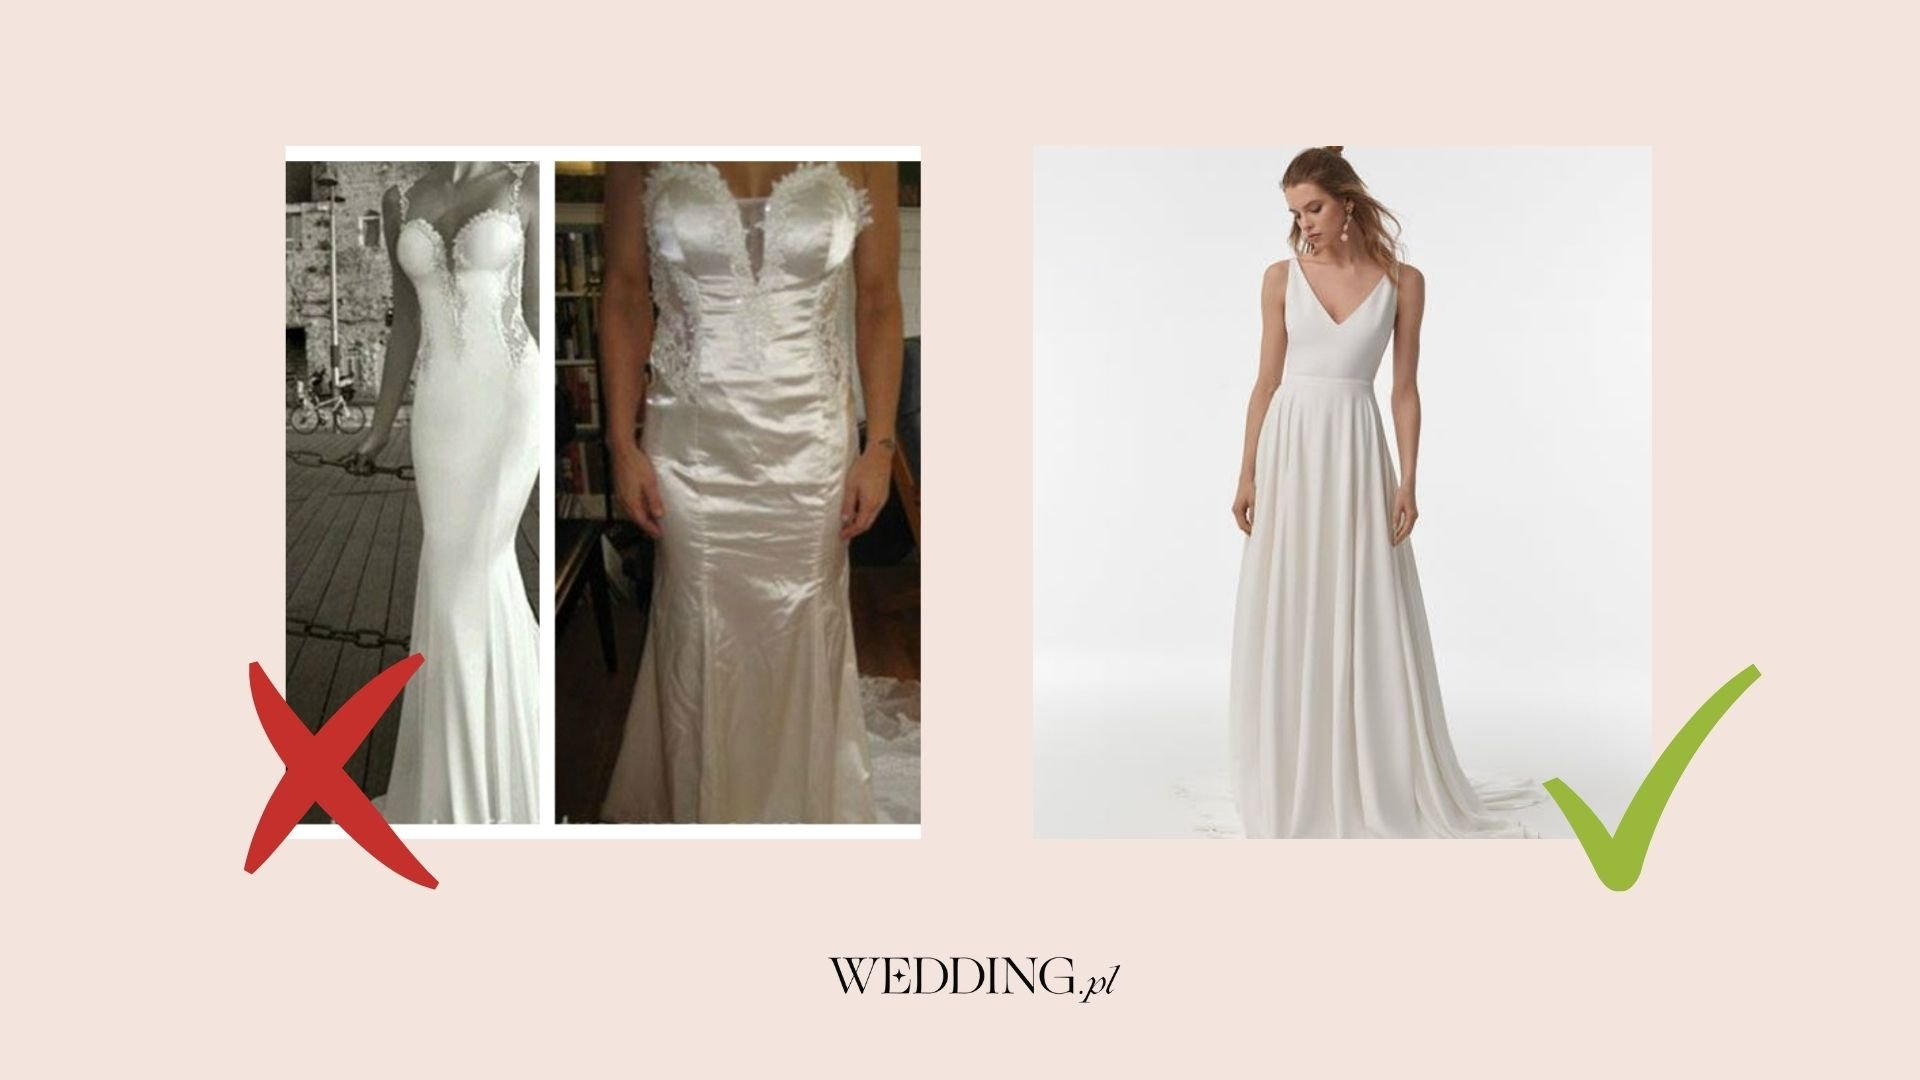 suknia ślubna - jakość a cena